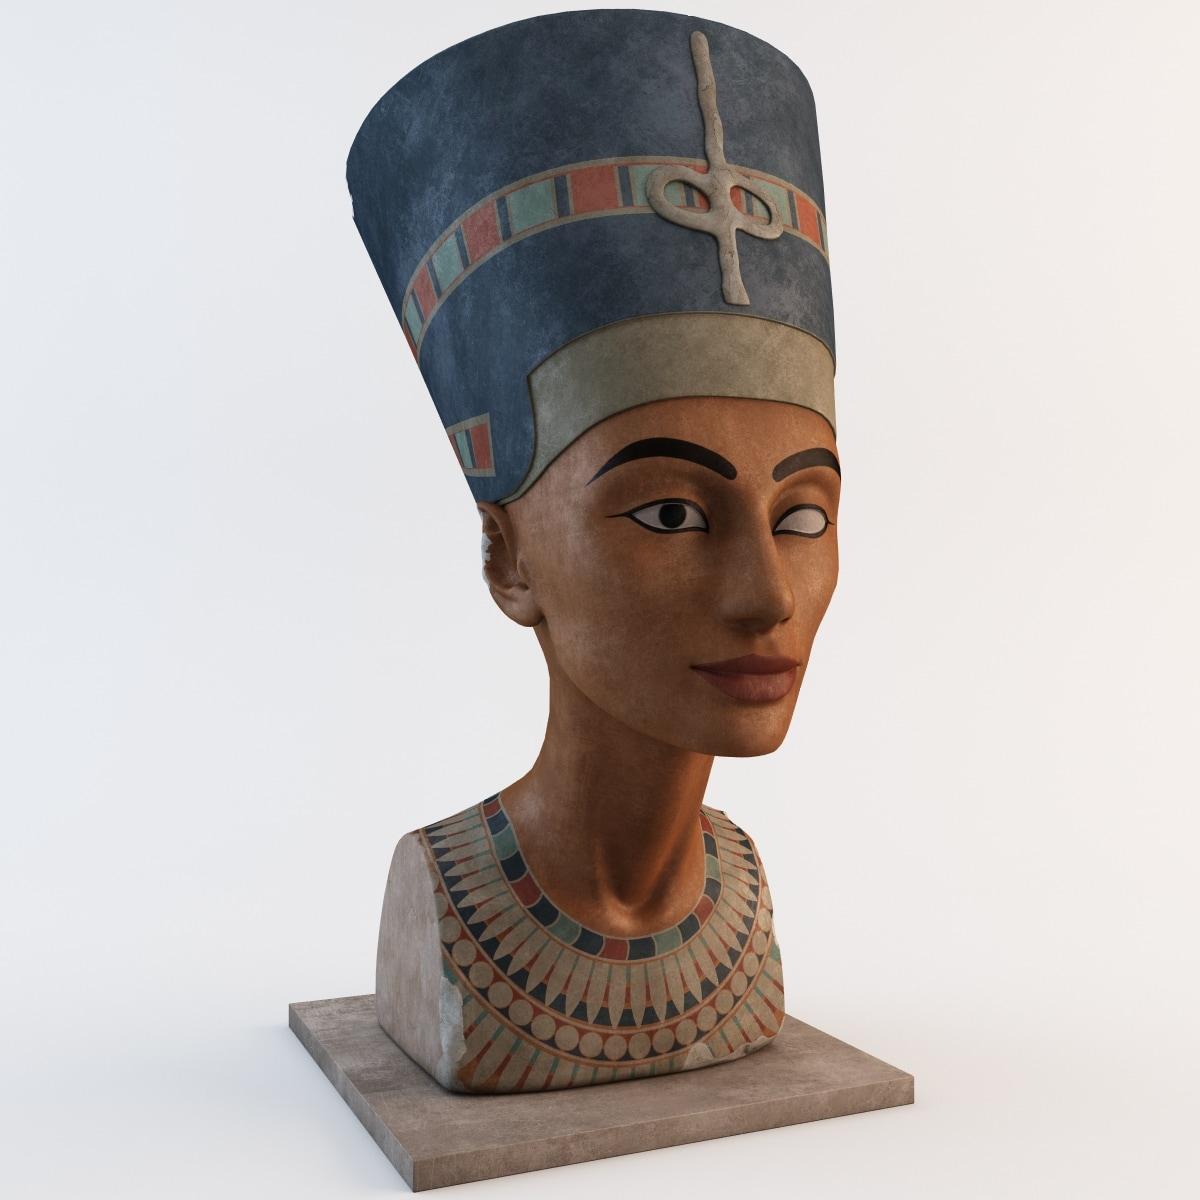 Egypt_Nefertiti_Bust_005.jpg